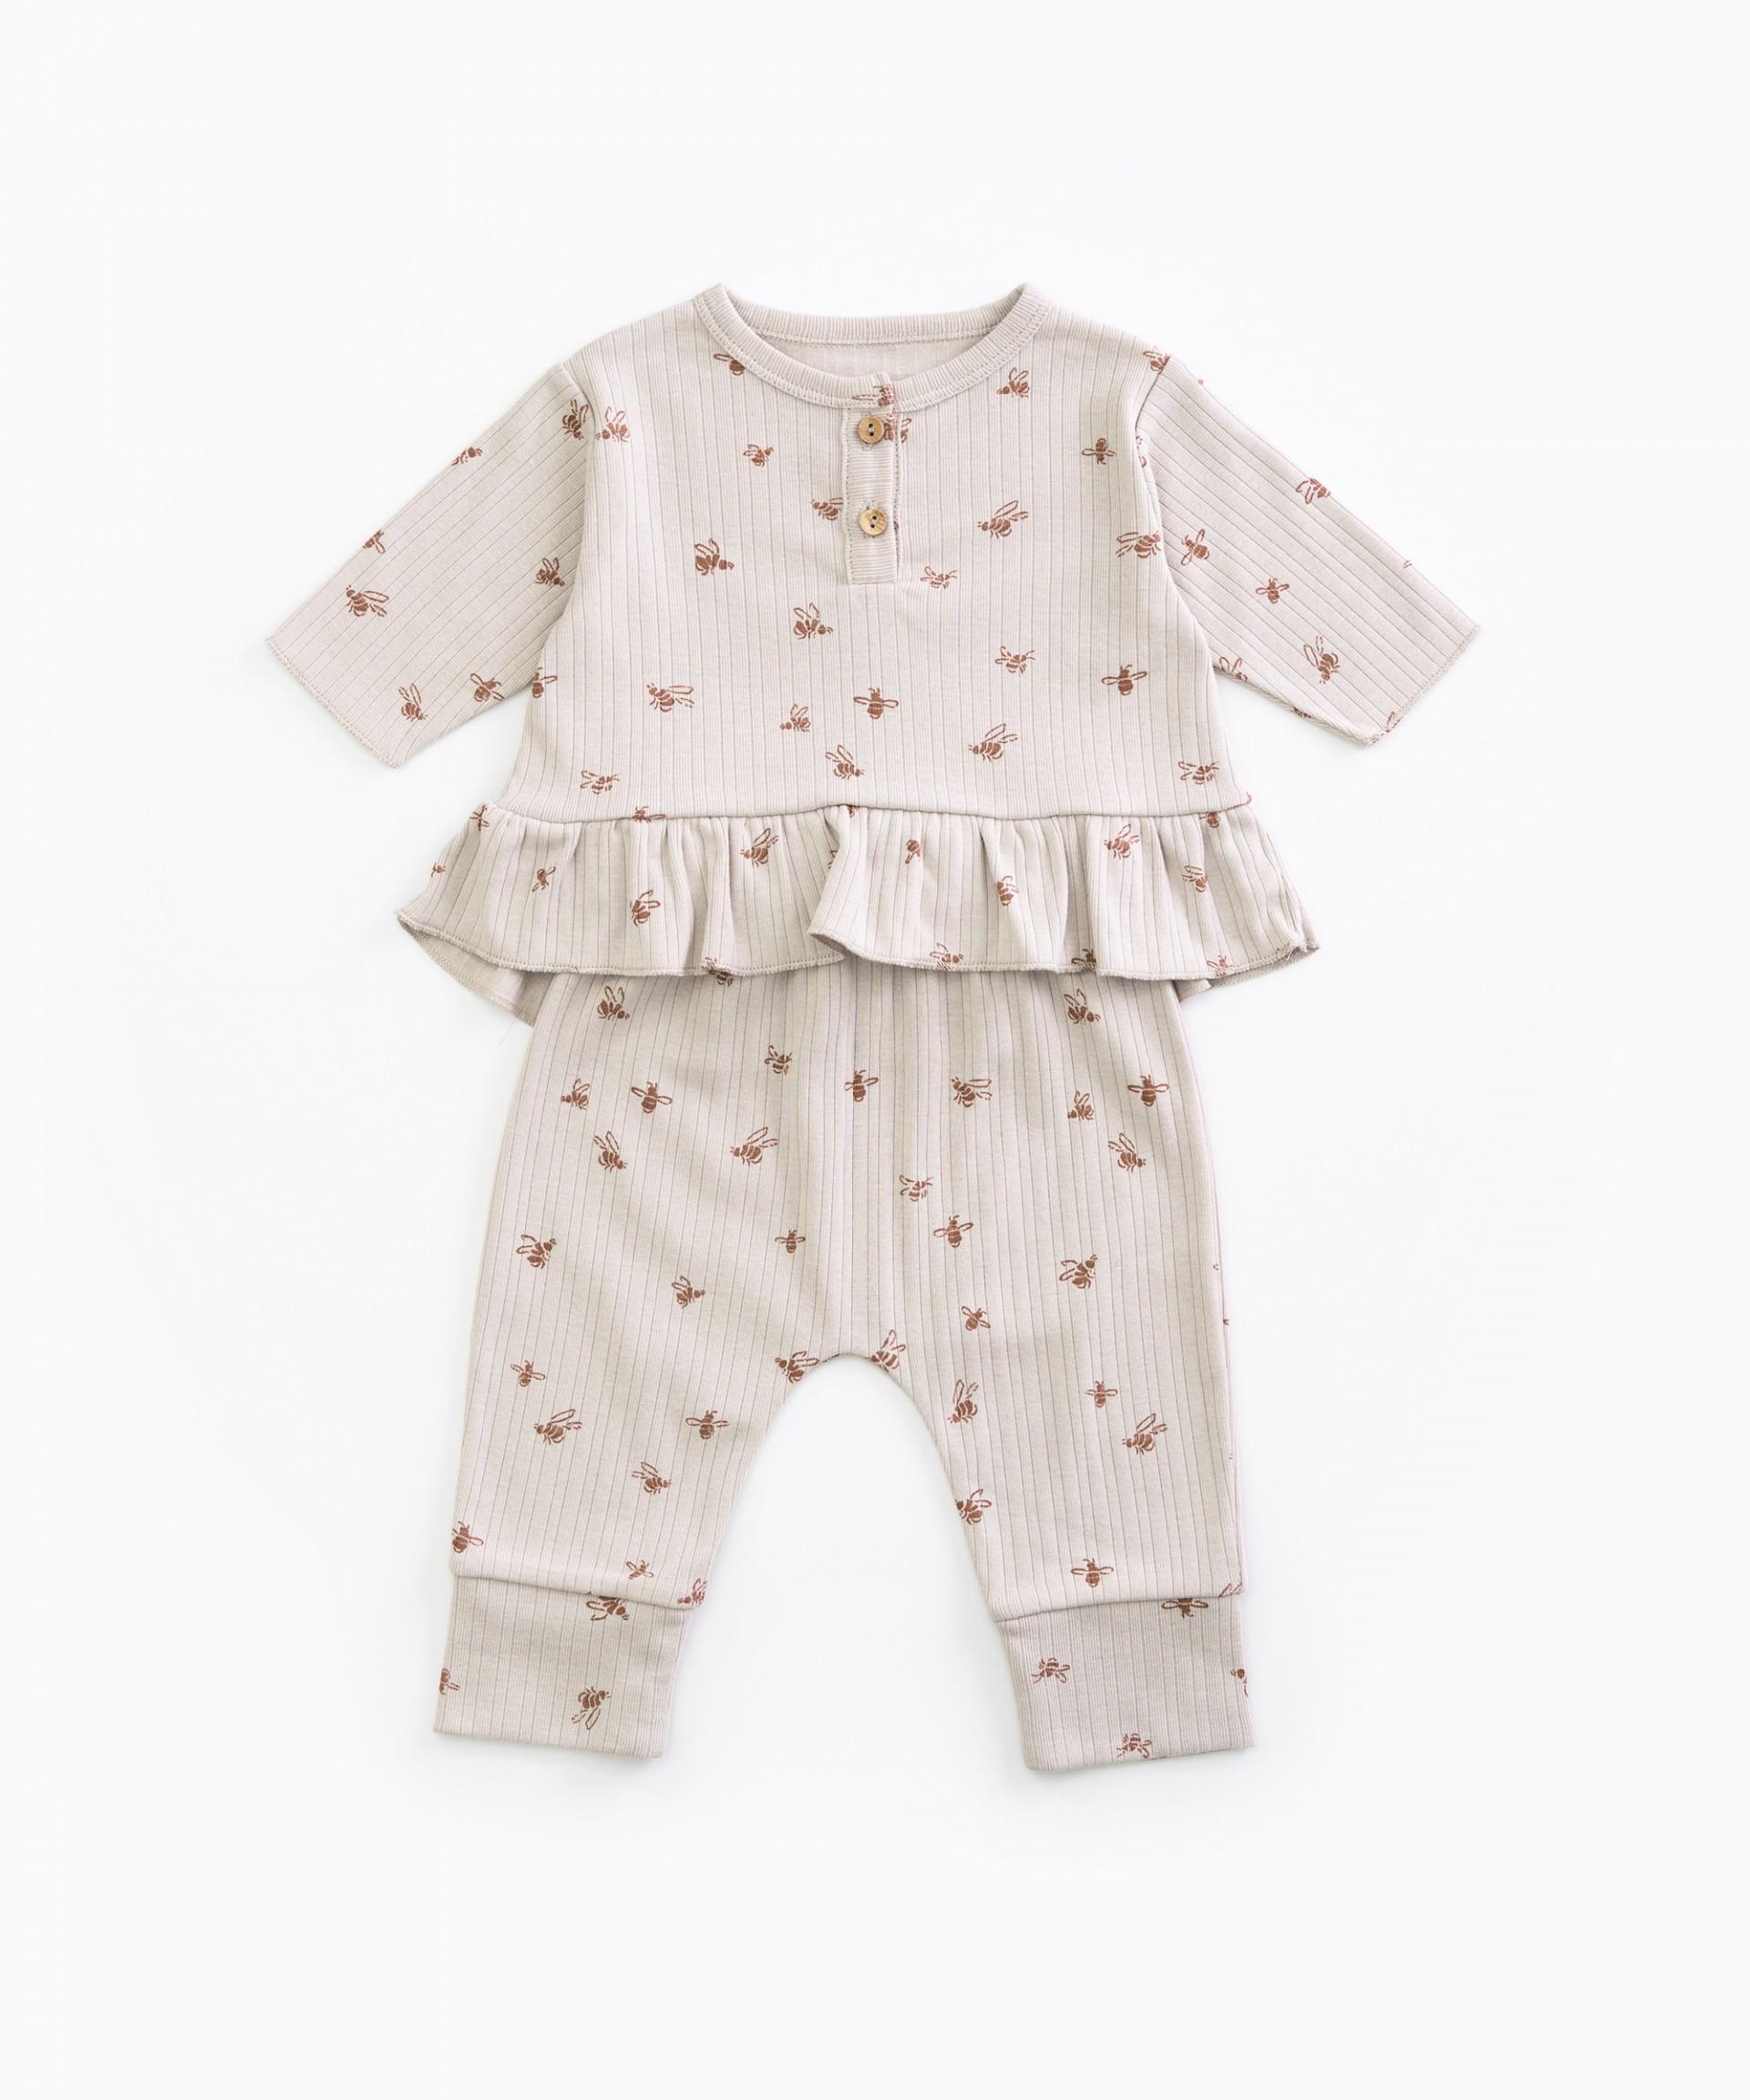 Pyjamas with bee print | Woodwork